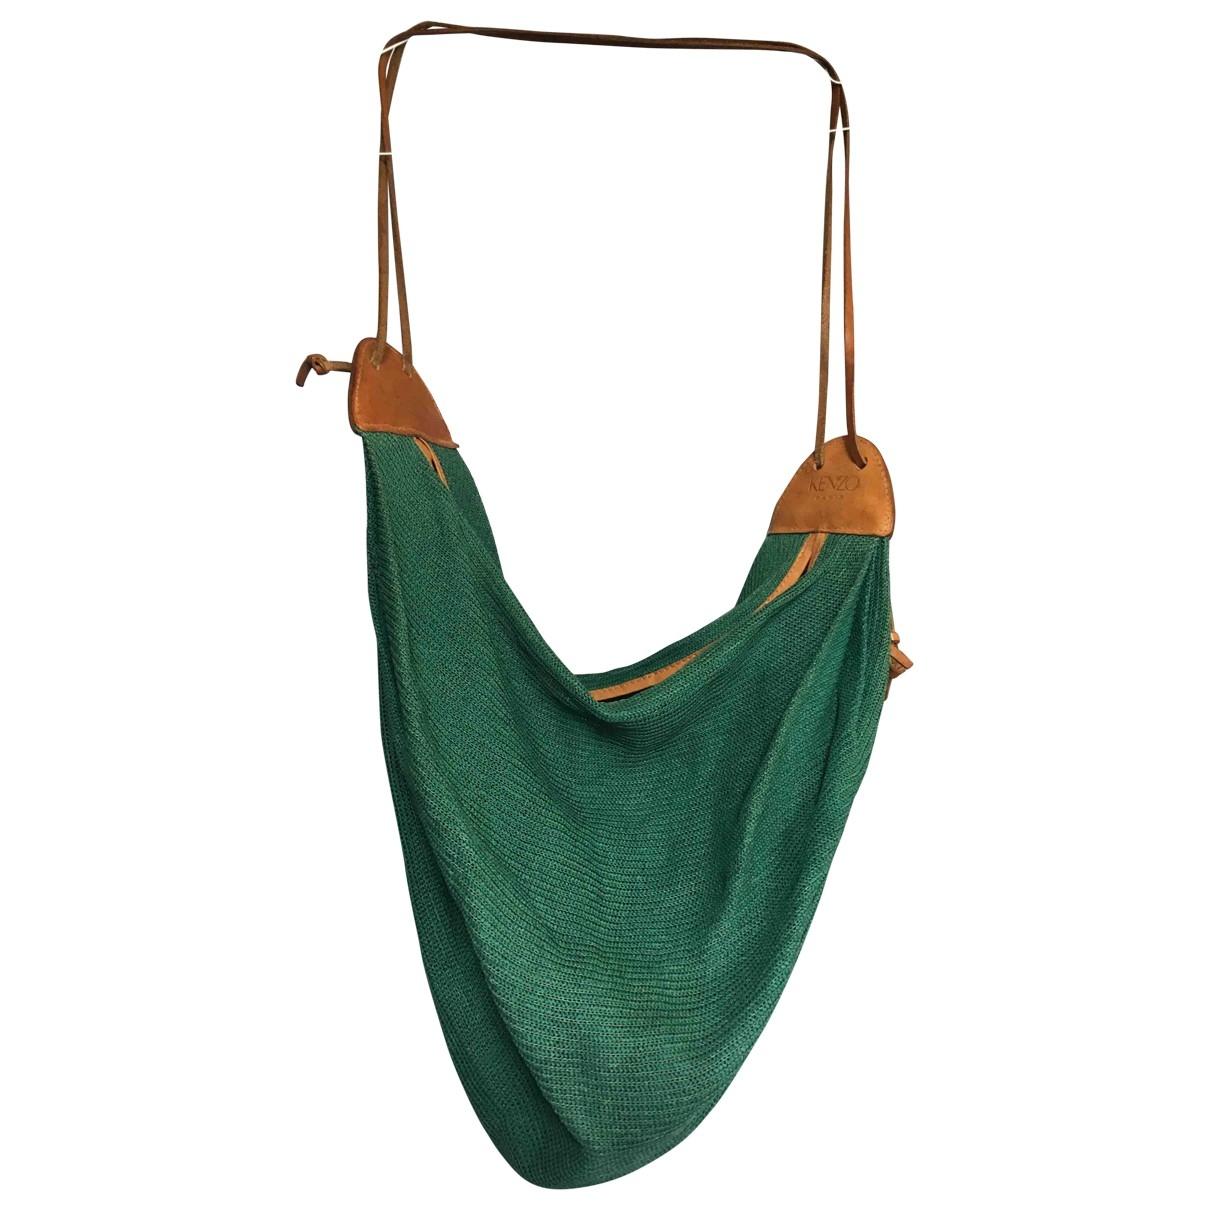 Kenzo \N Green Cloth handbag for Women \N